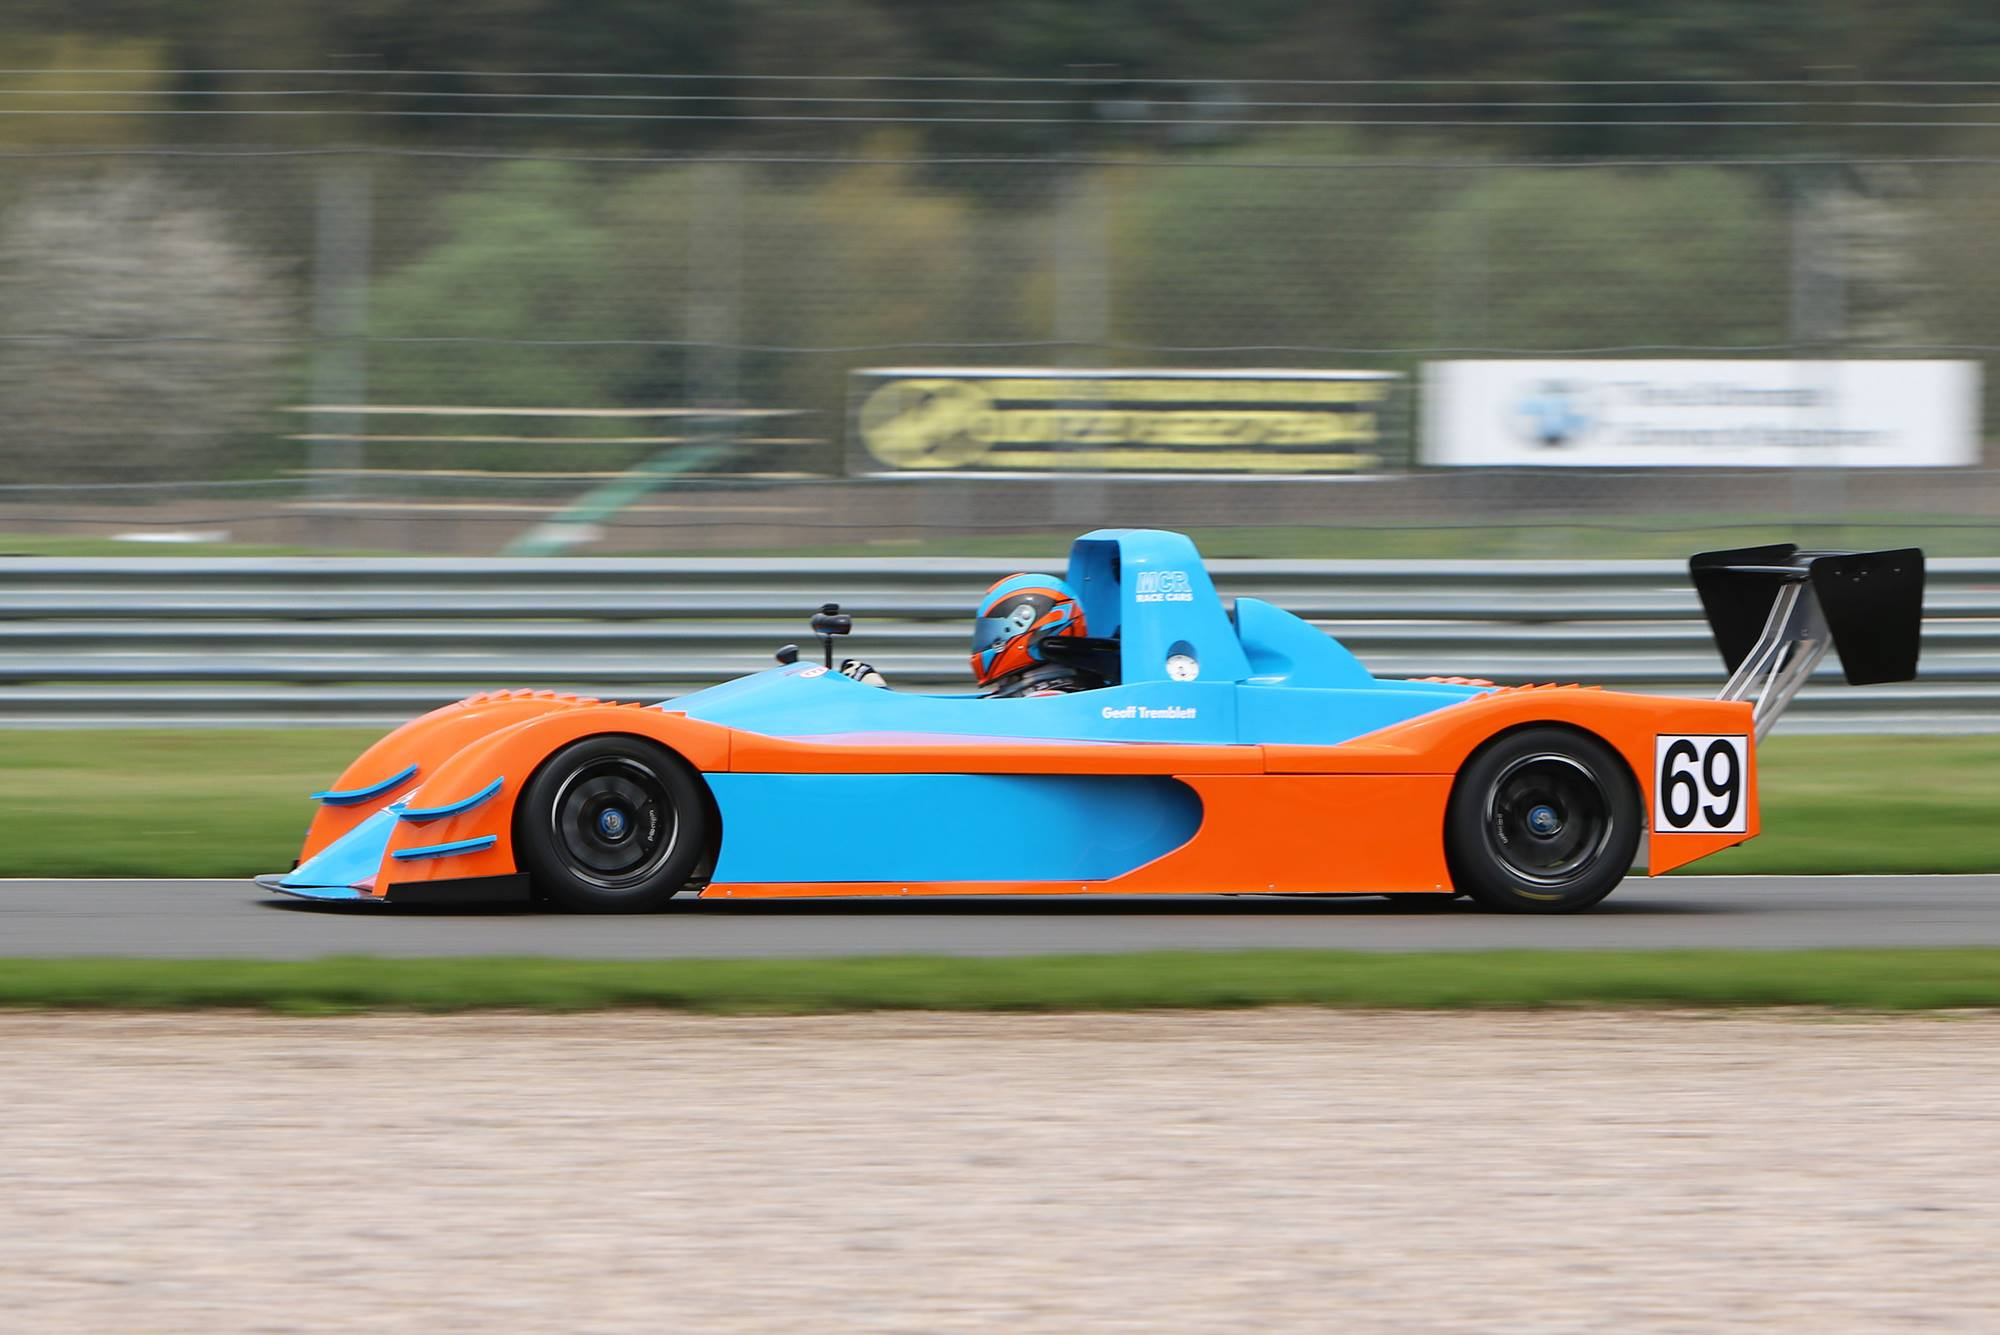 MCR S2 Racing Cars